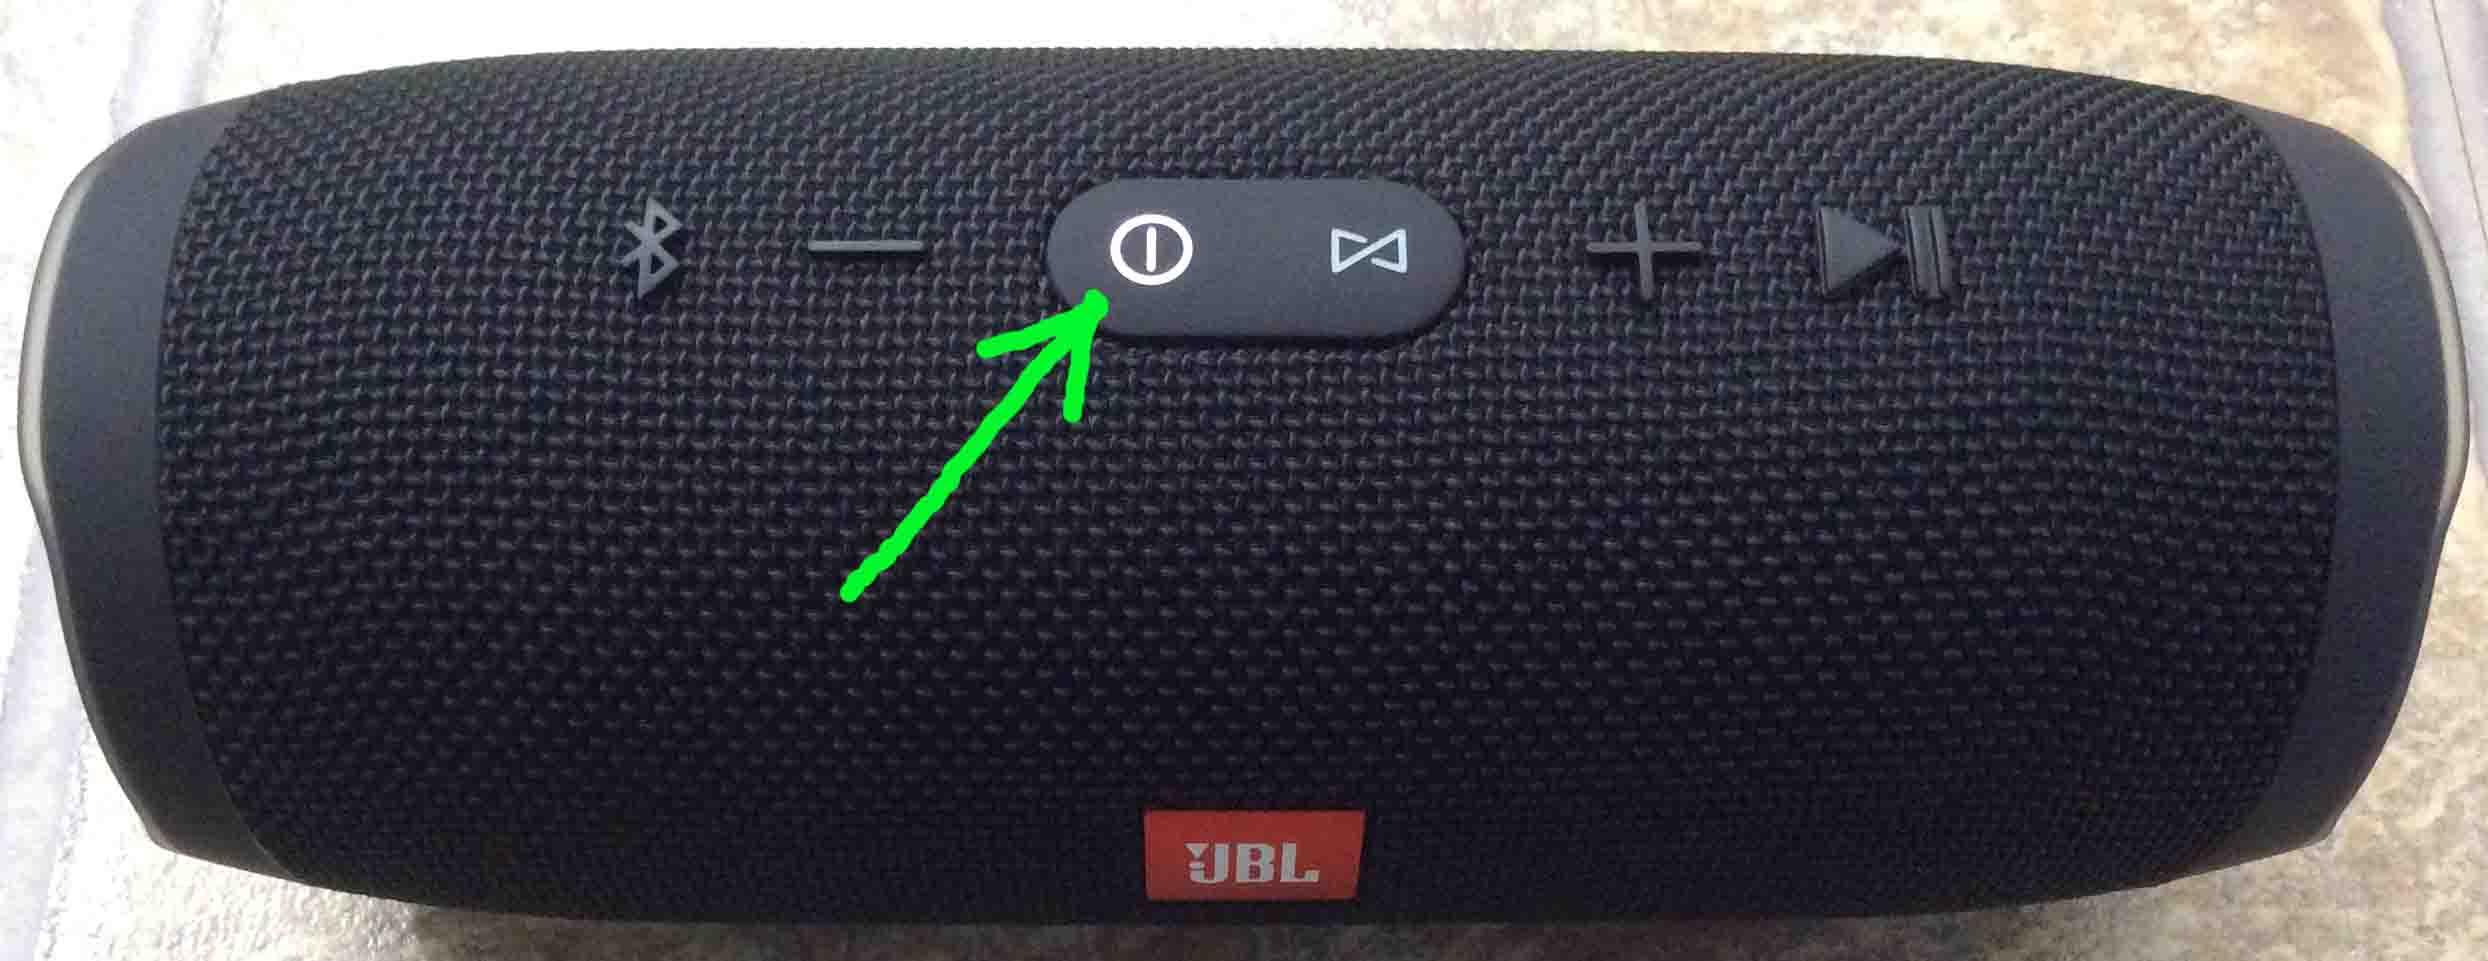 JBL Charge 3 Hard Reset Instructions   Tom's Tek Stop